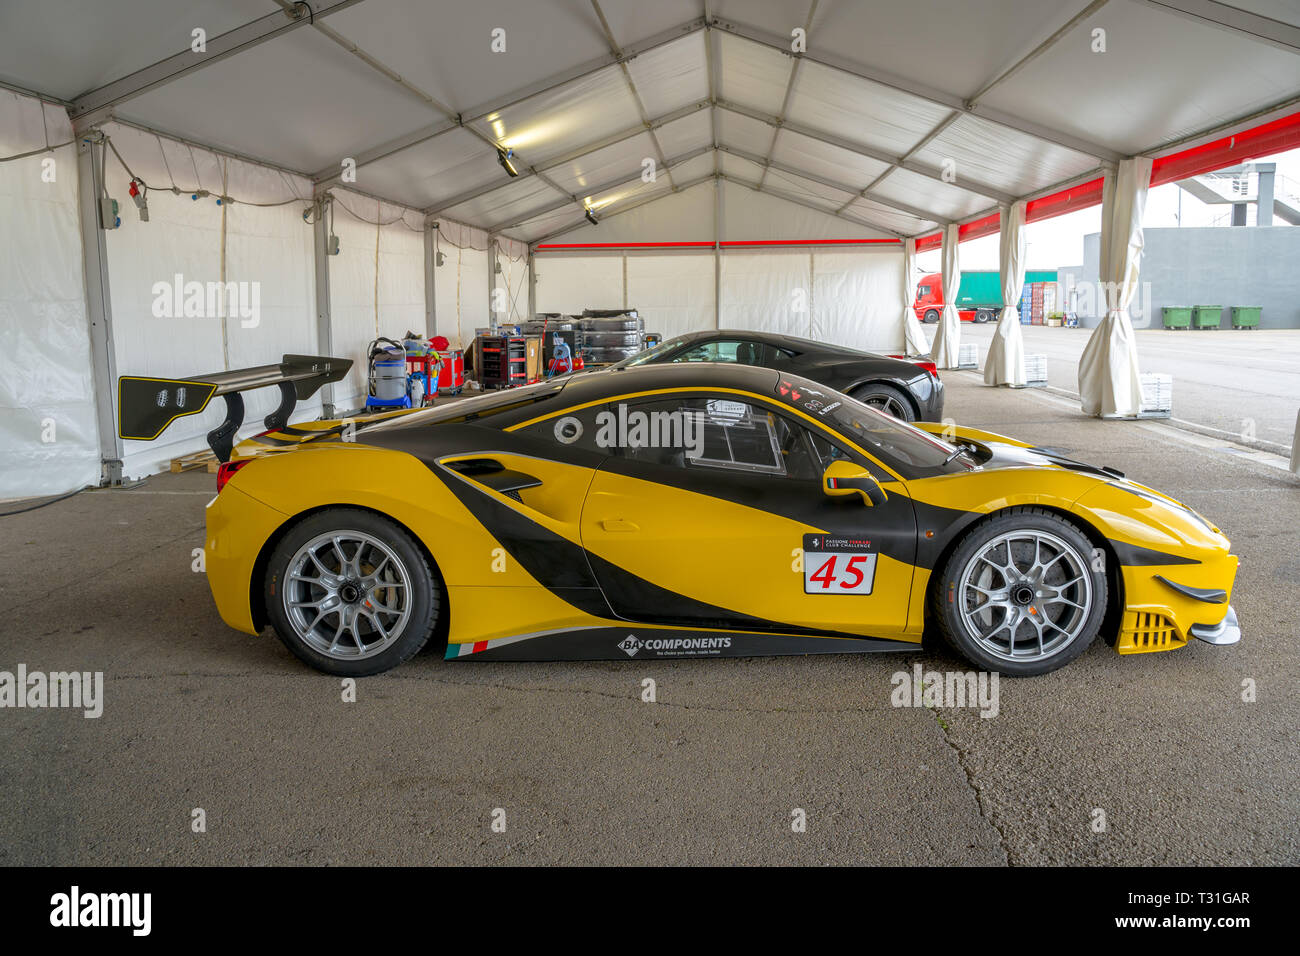 Valencia Spain March 30 2019 Yellow Ferrari 458 Speciale A Luxury Sport Car Car Showroom Stock Photo Alamy